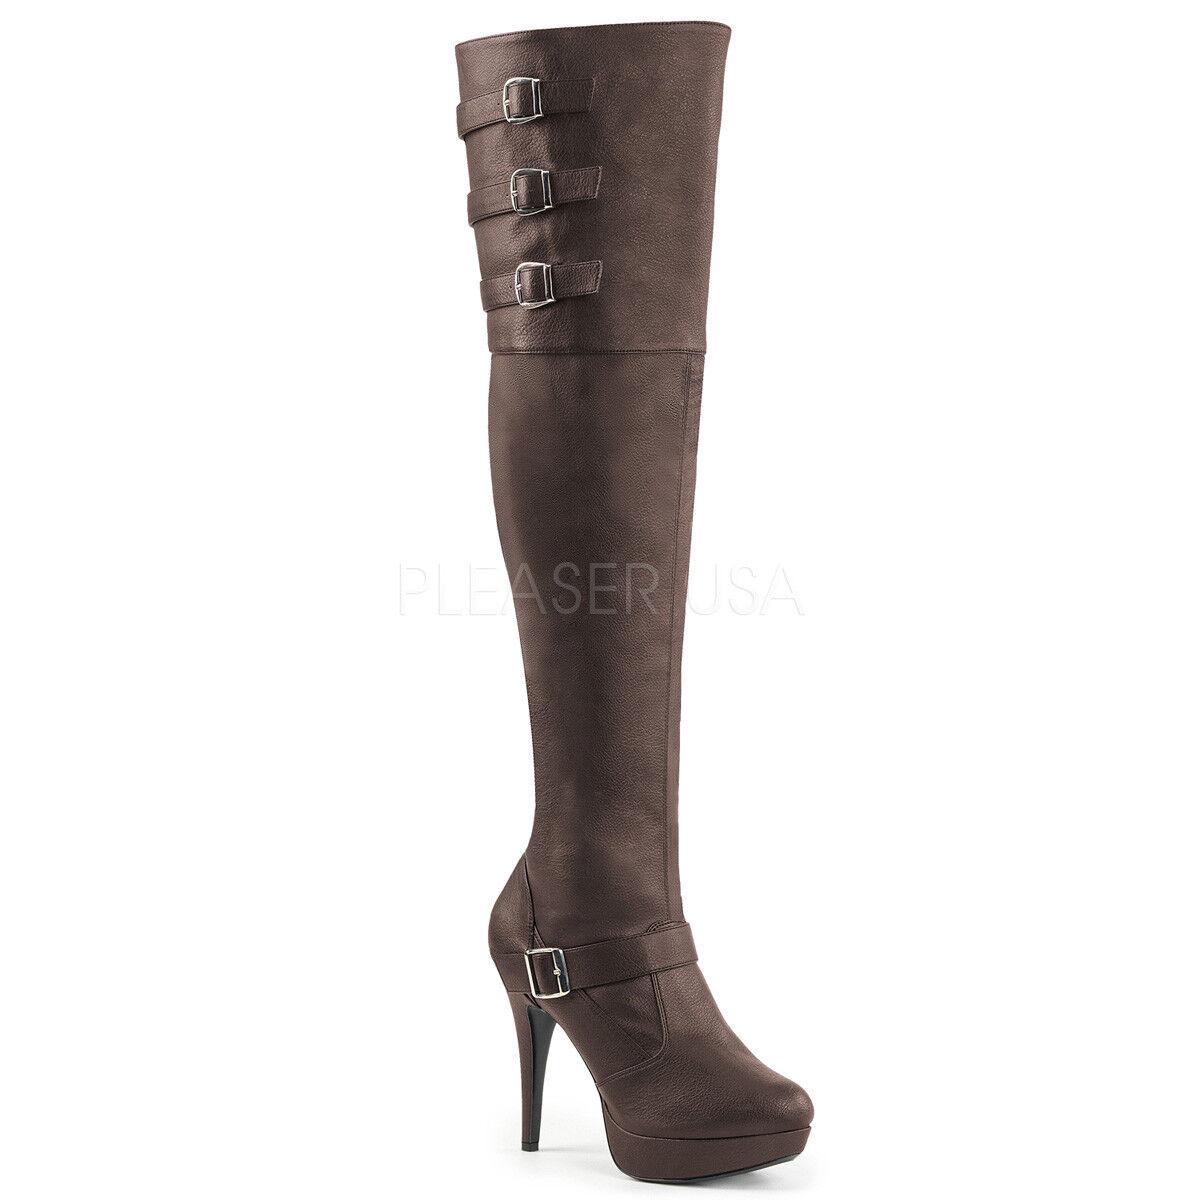 Negro Alto del del del muslo Sobre La Rodilla Cuero botas De Plataforma Mujer Talla 9 10 11 12 e5935d